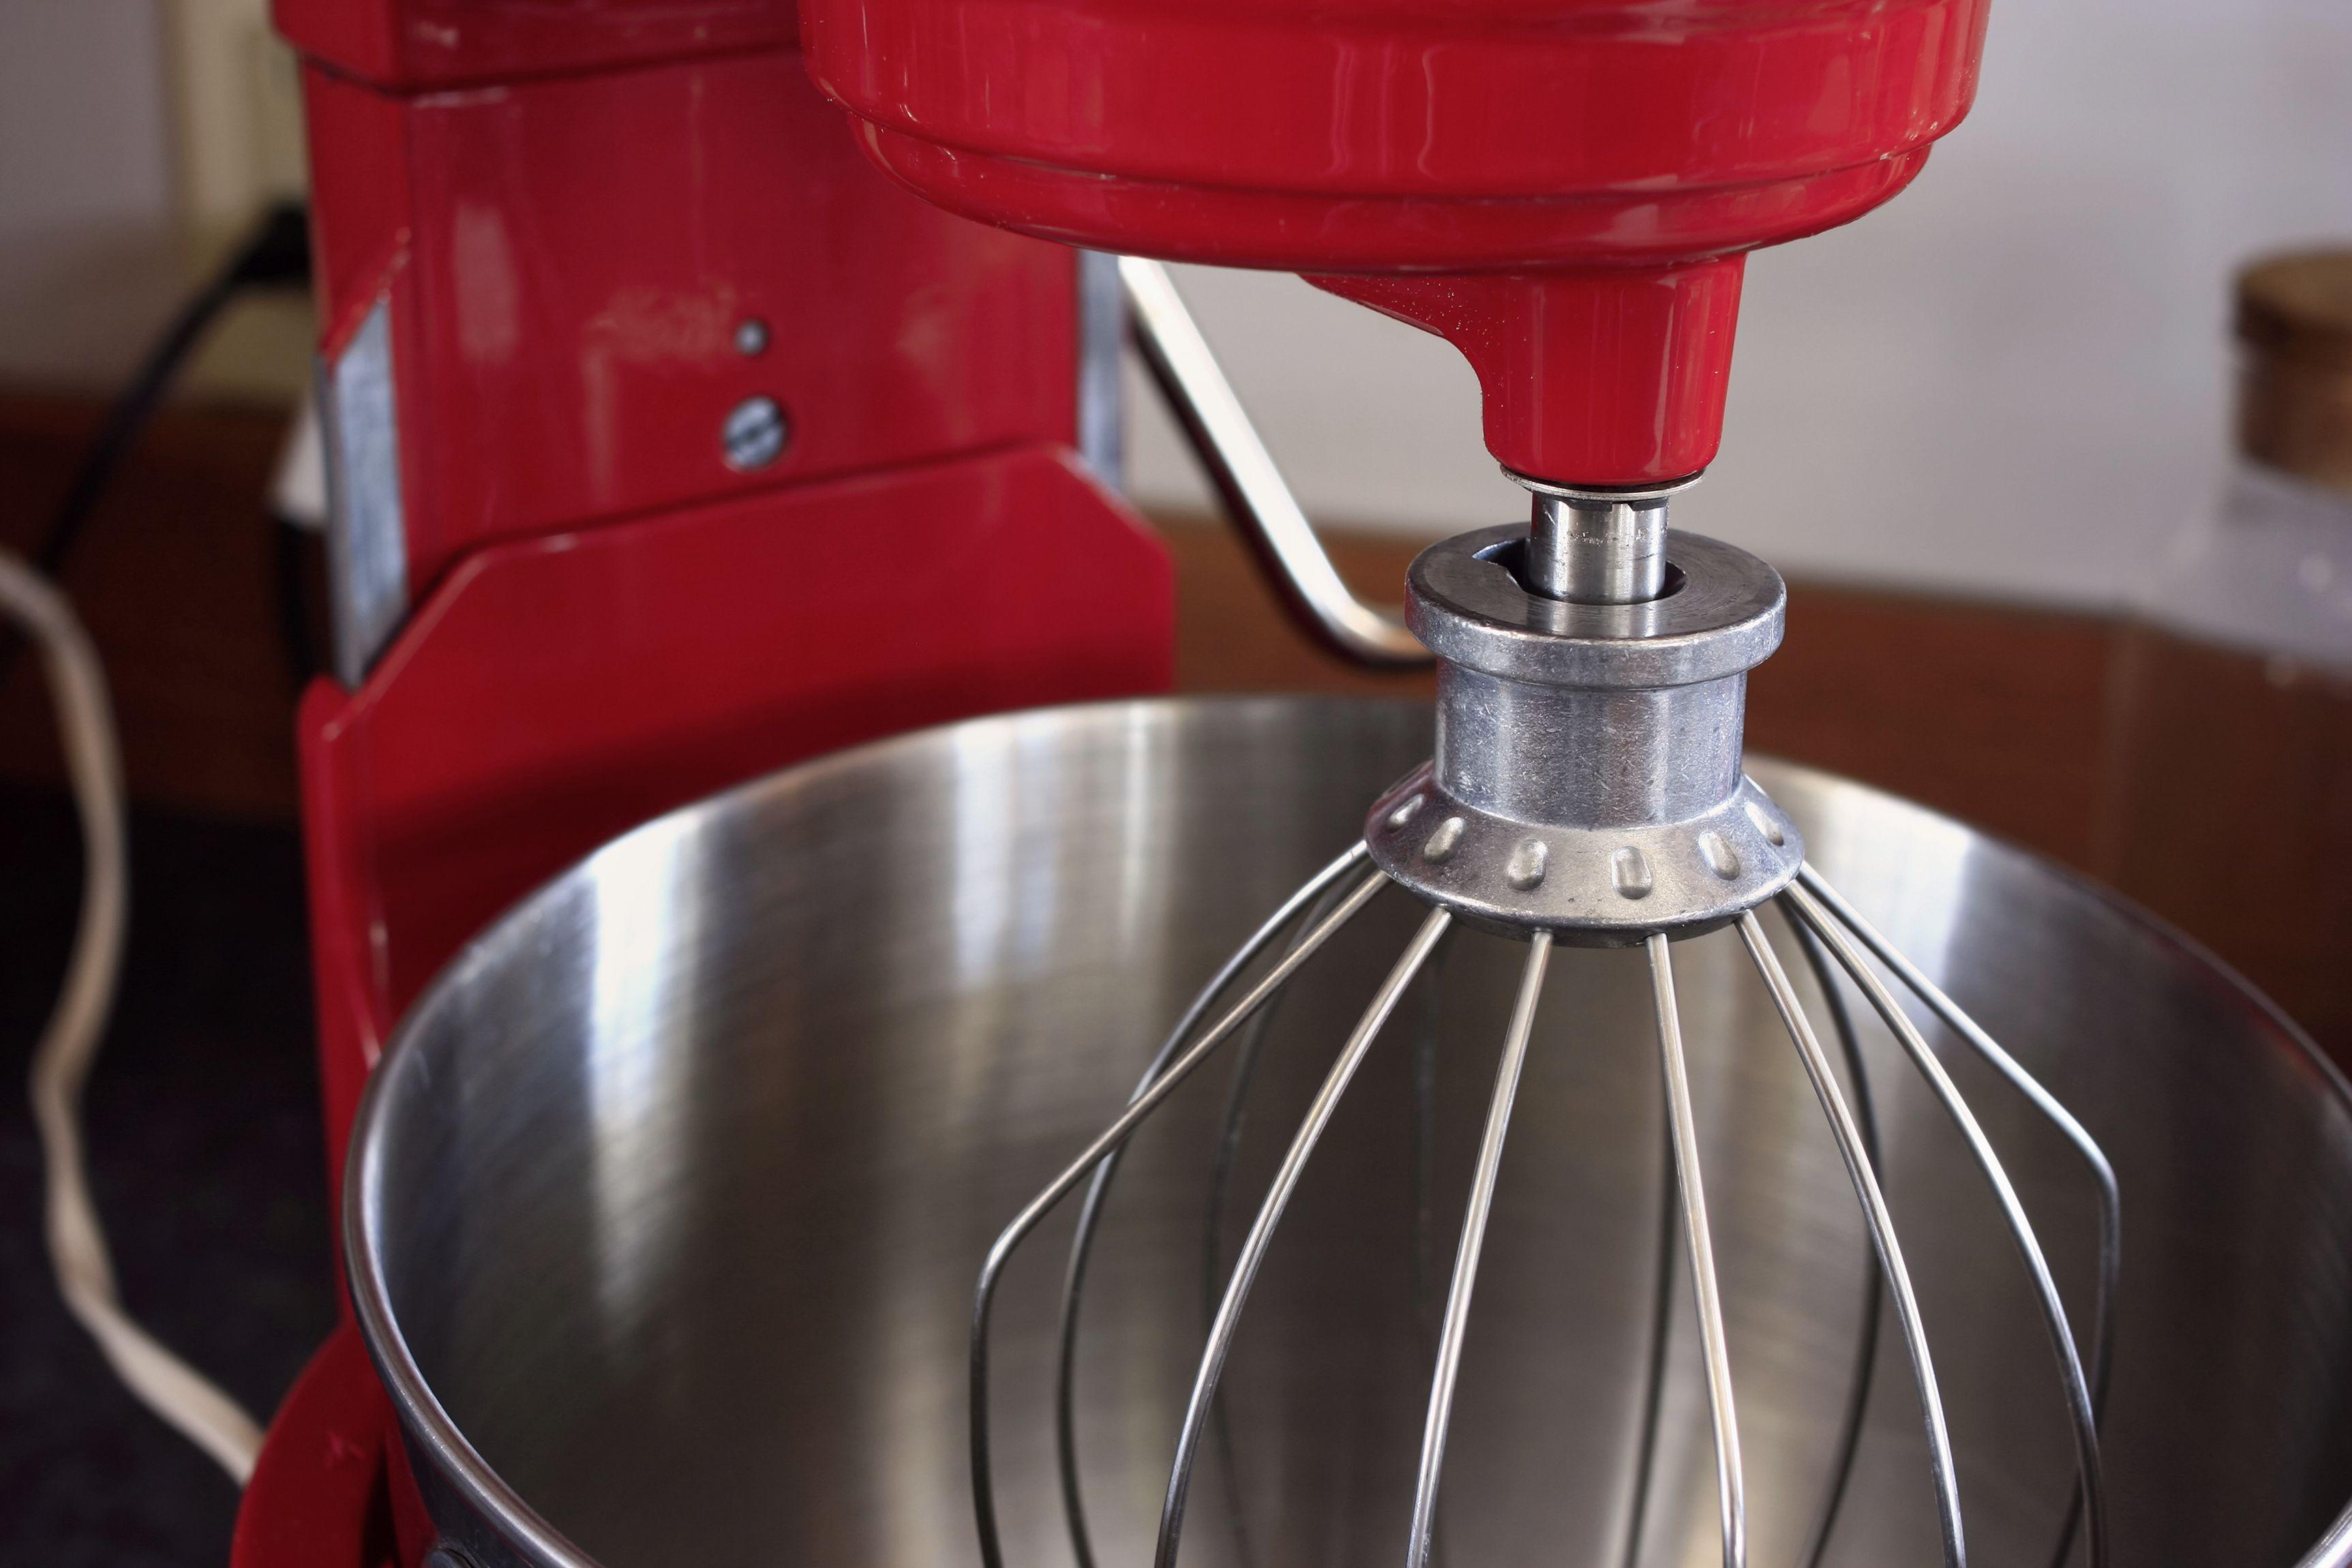 Beater To Bowl Clearance Adjusting KitchenAid Mixer